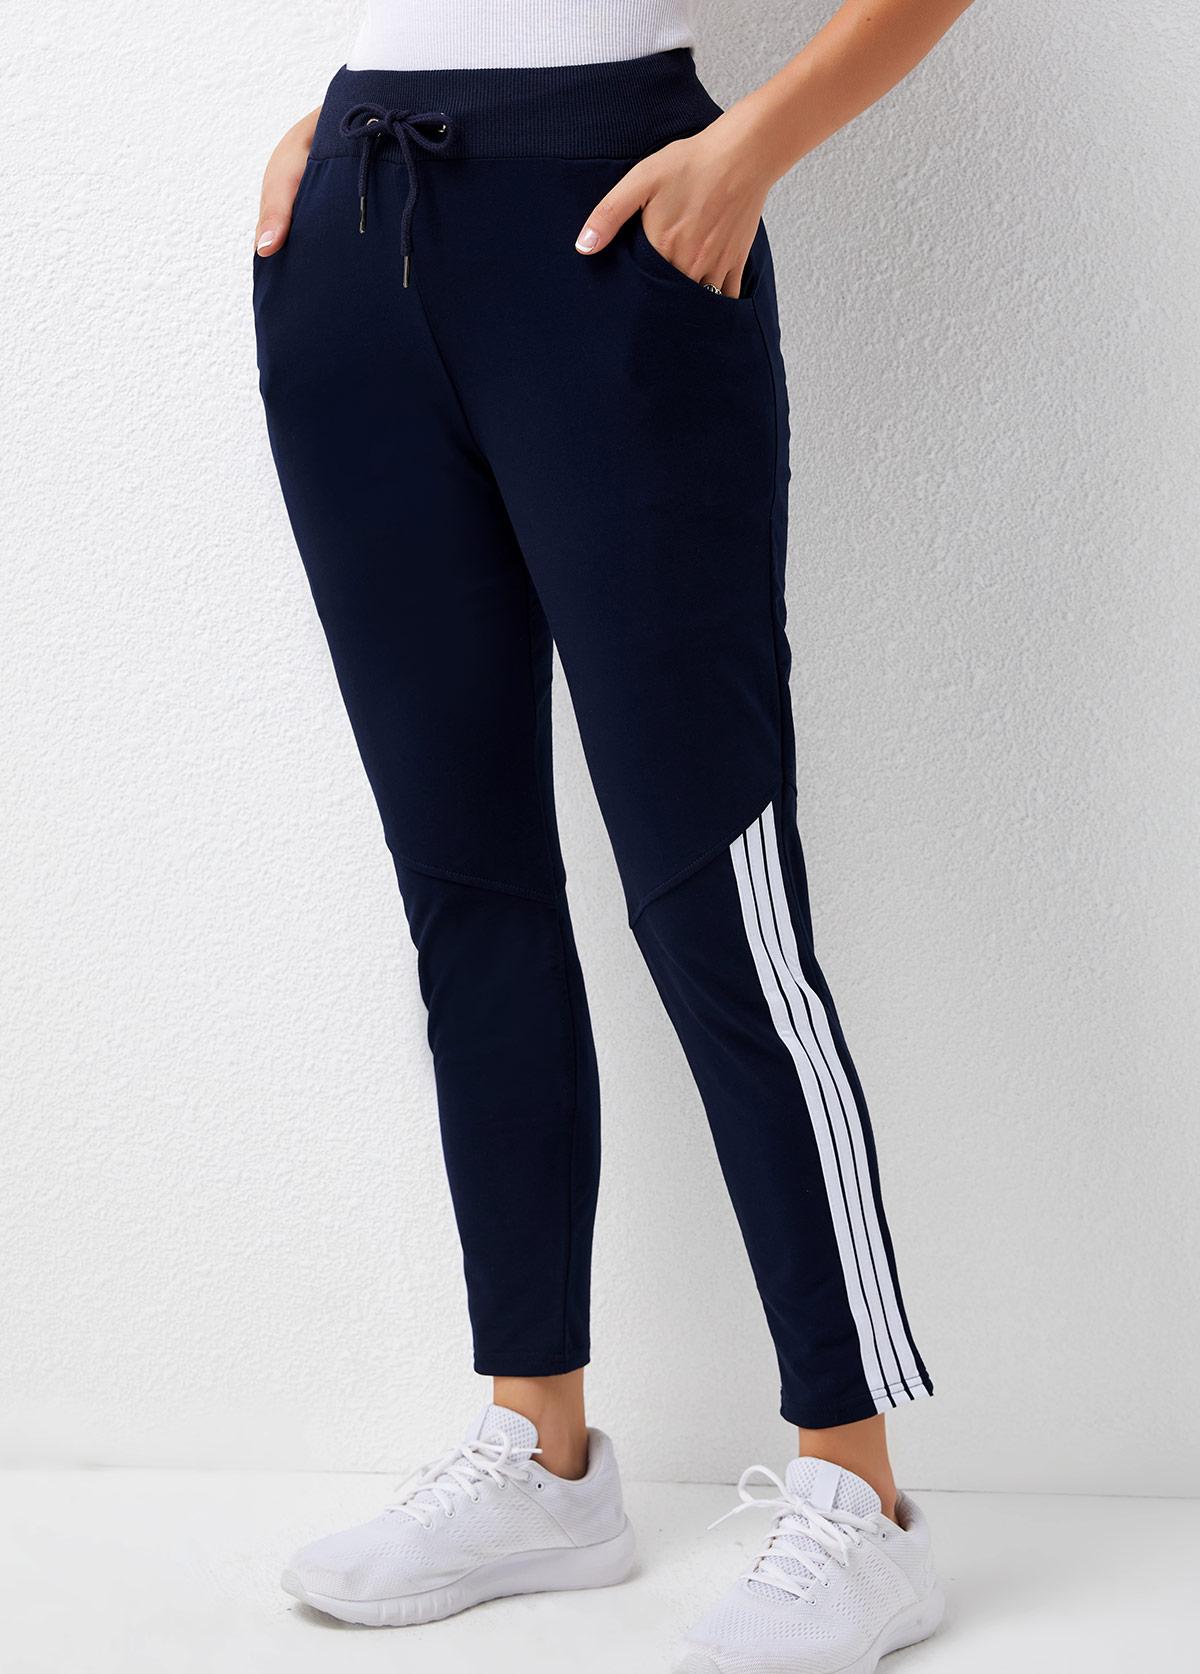 Contrast Striped Mid Waist Pocket Detail Pants